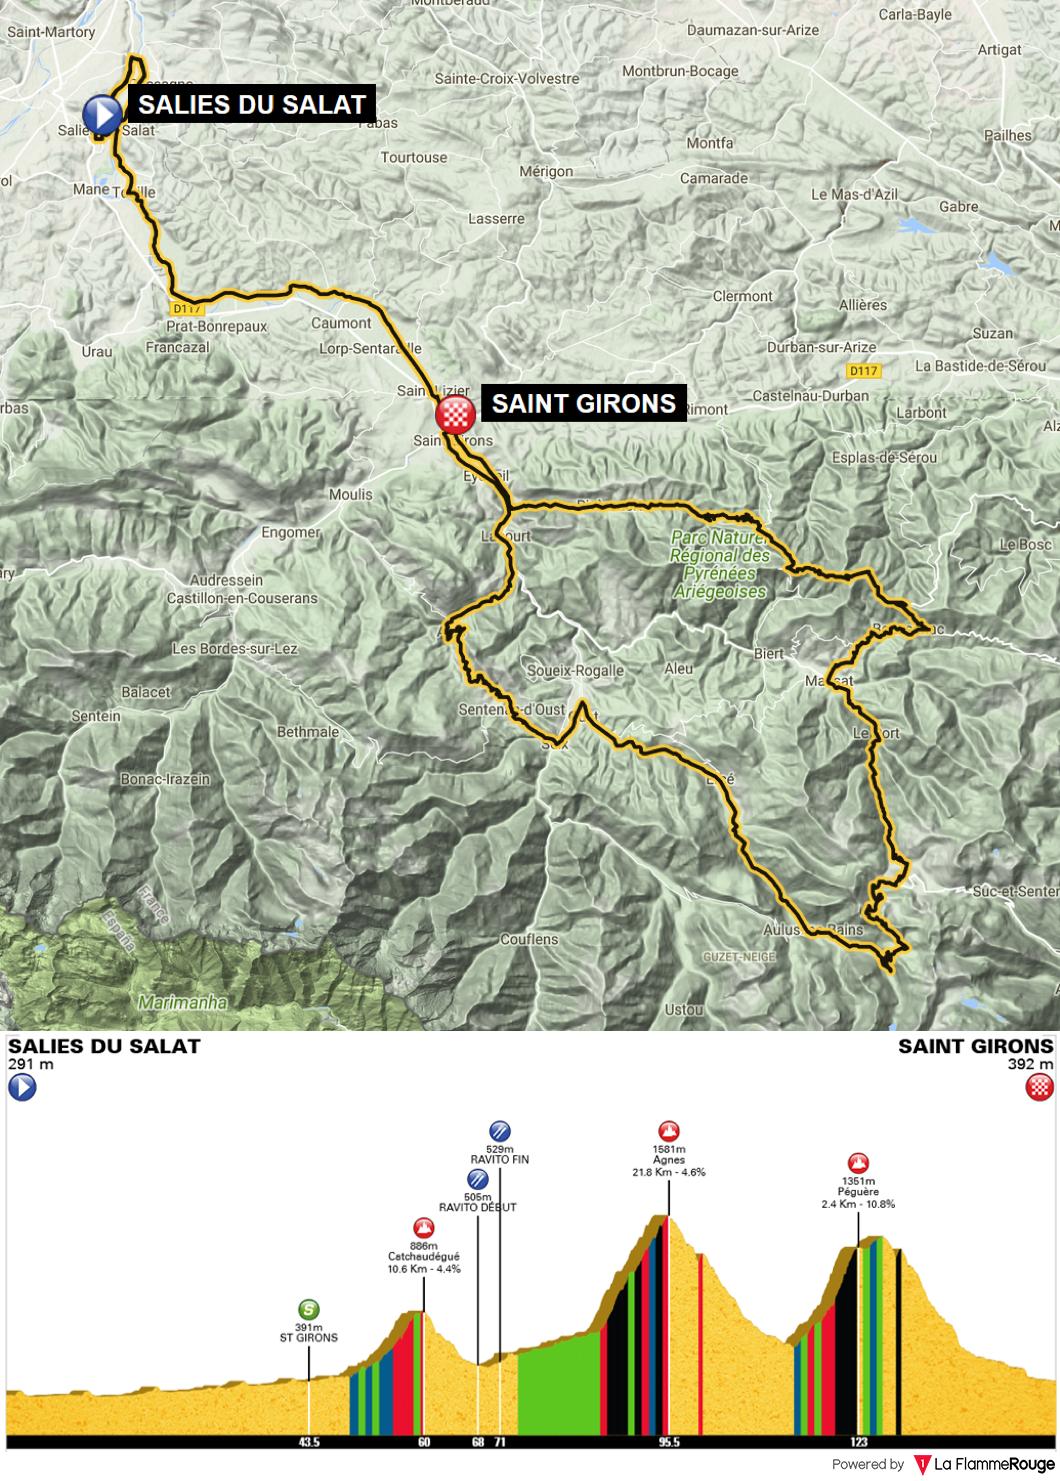 Tappa: 4 - 20 Maggio: Salies-du-Salat - Saint-Girons, 152.40 km